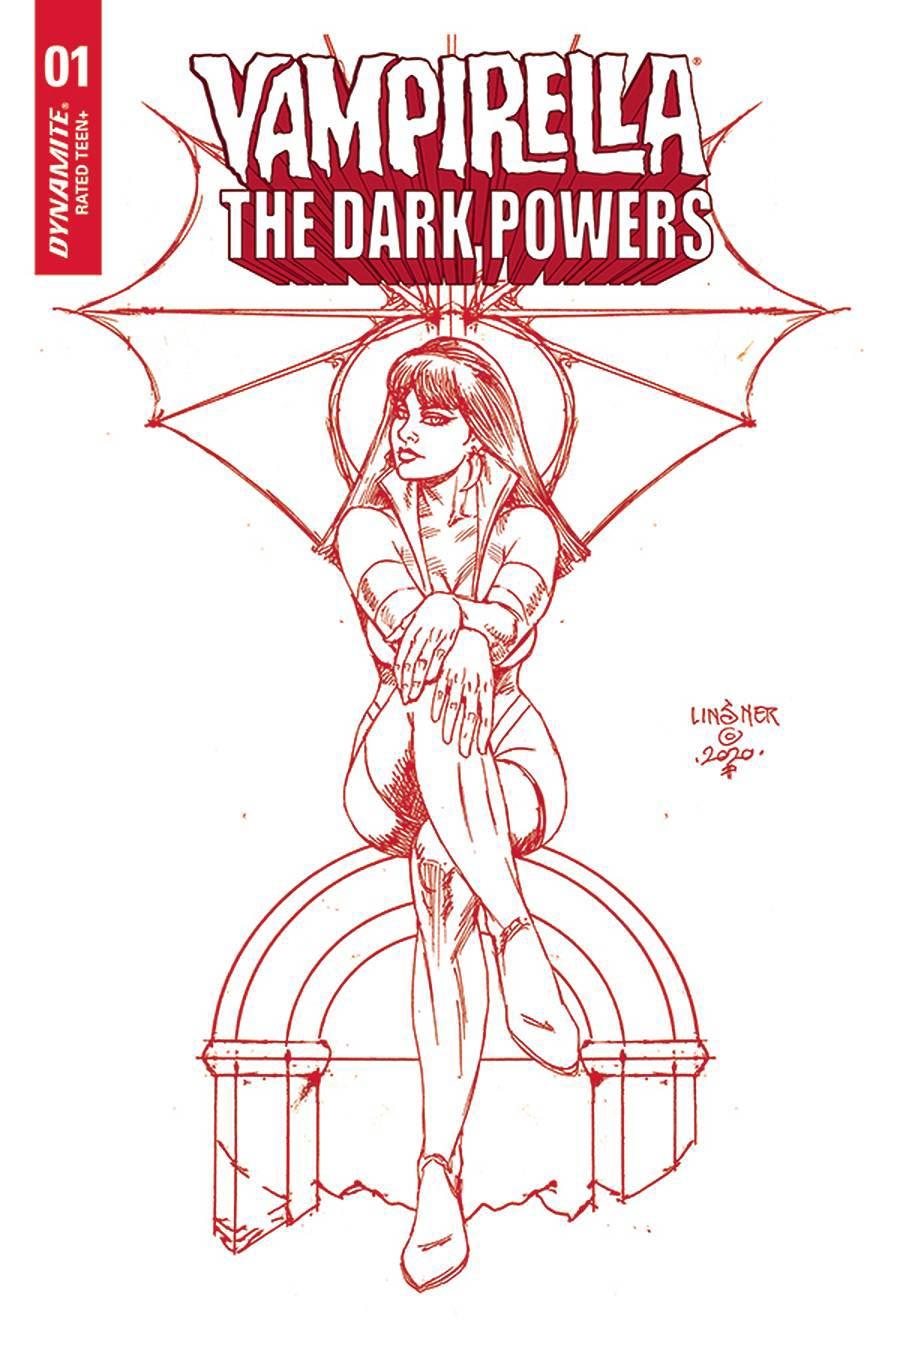 Vampirella The Dark Powers #2 Cover Z-A Ultra-Premium Limited Edition Joseph Michael Linsner Crimson Red Line Art Cover